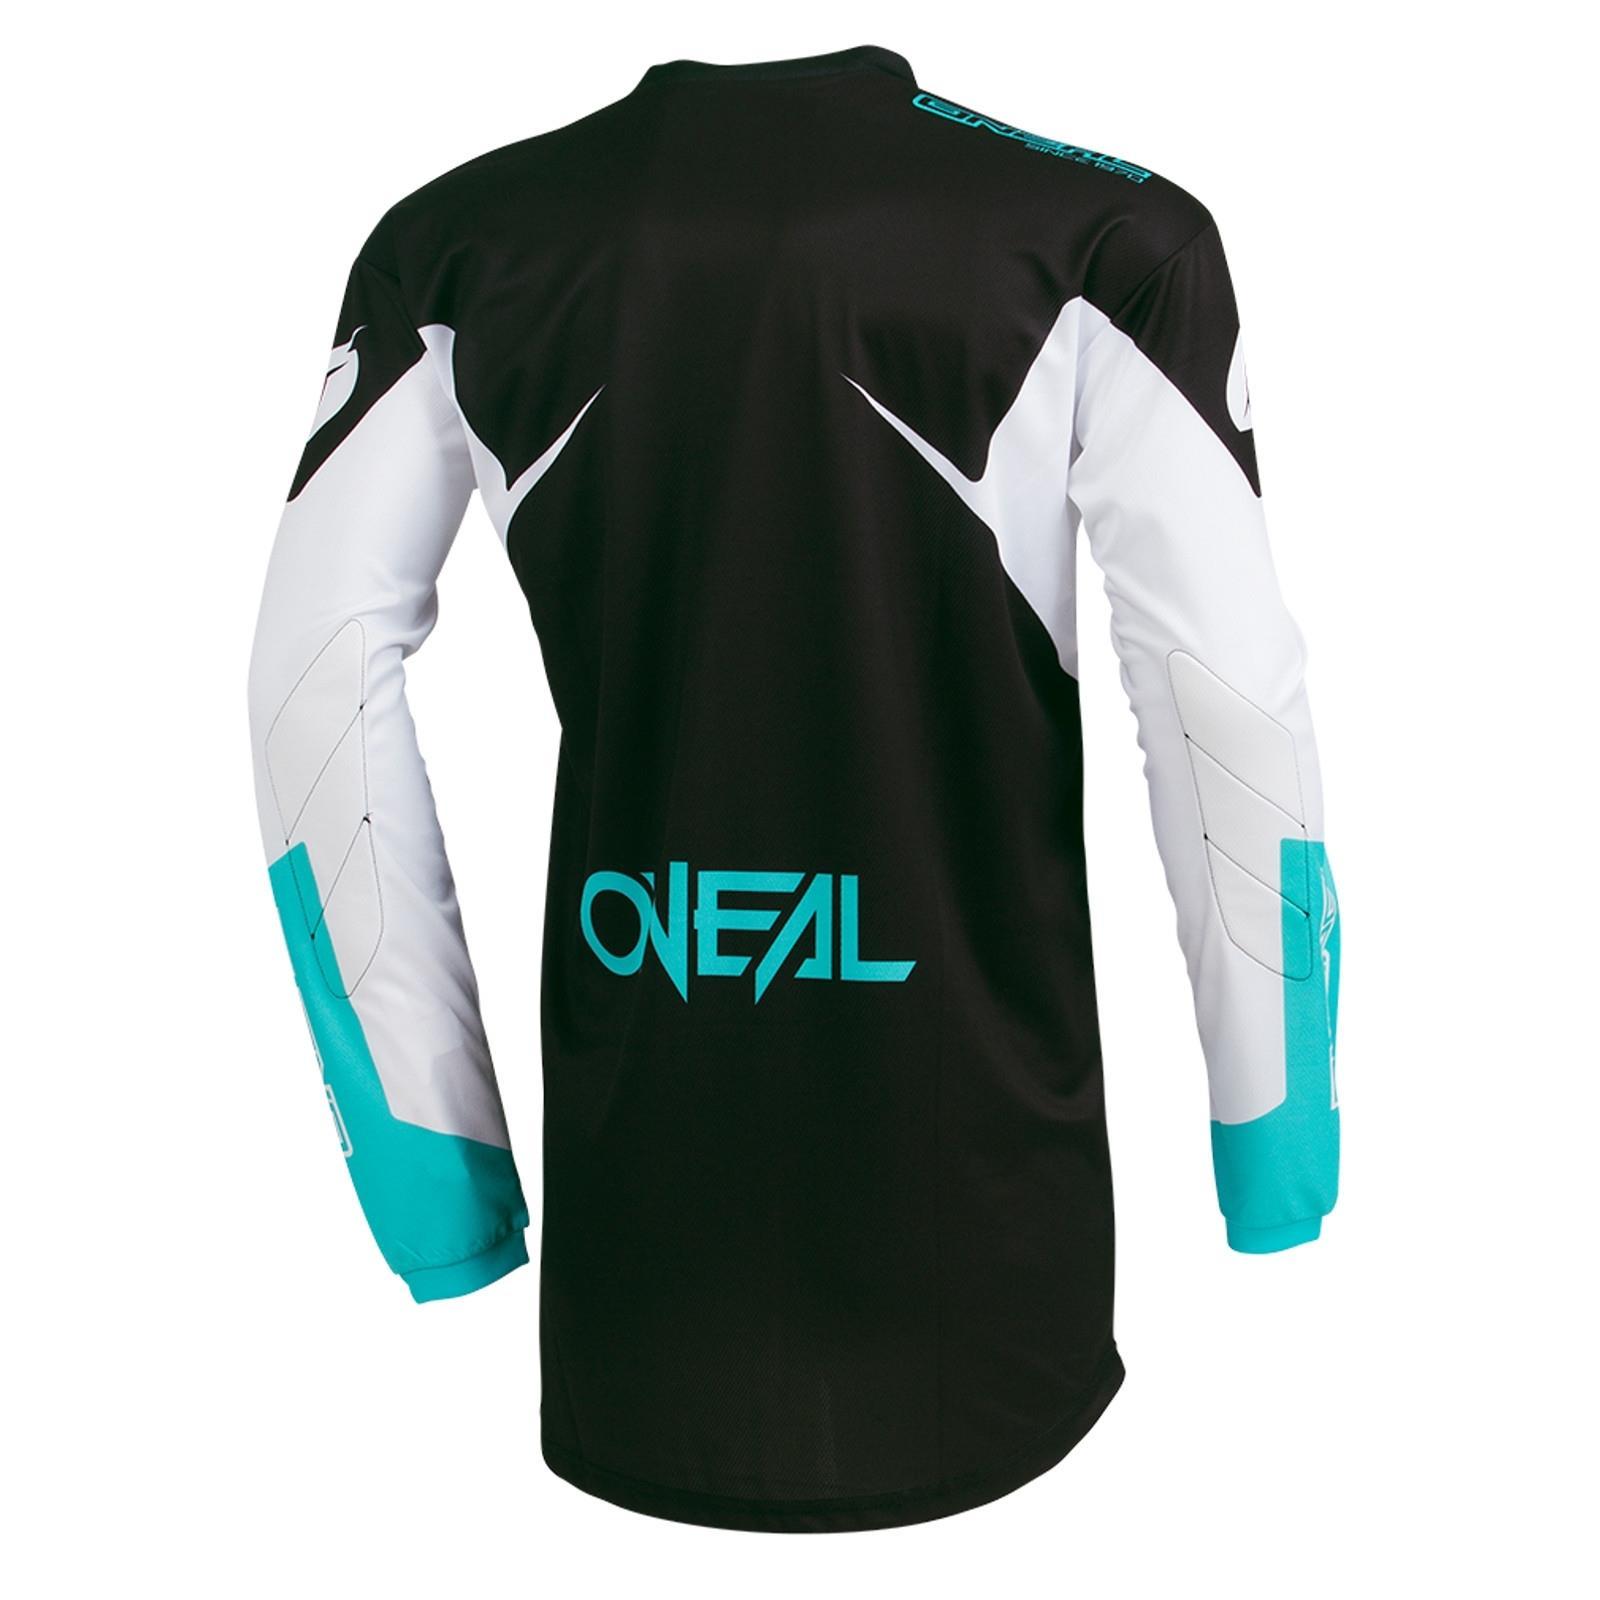 O-039-Neal-Element-Racewear-MOTOCROSS-JERSEY-MX-ENDURO-CROSS-MAGLIA-MOUNTAIN-BIKE miniatura 15